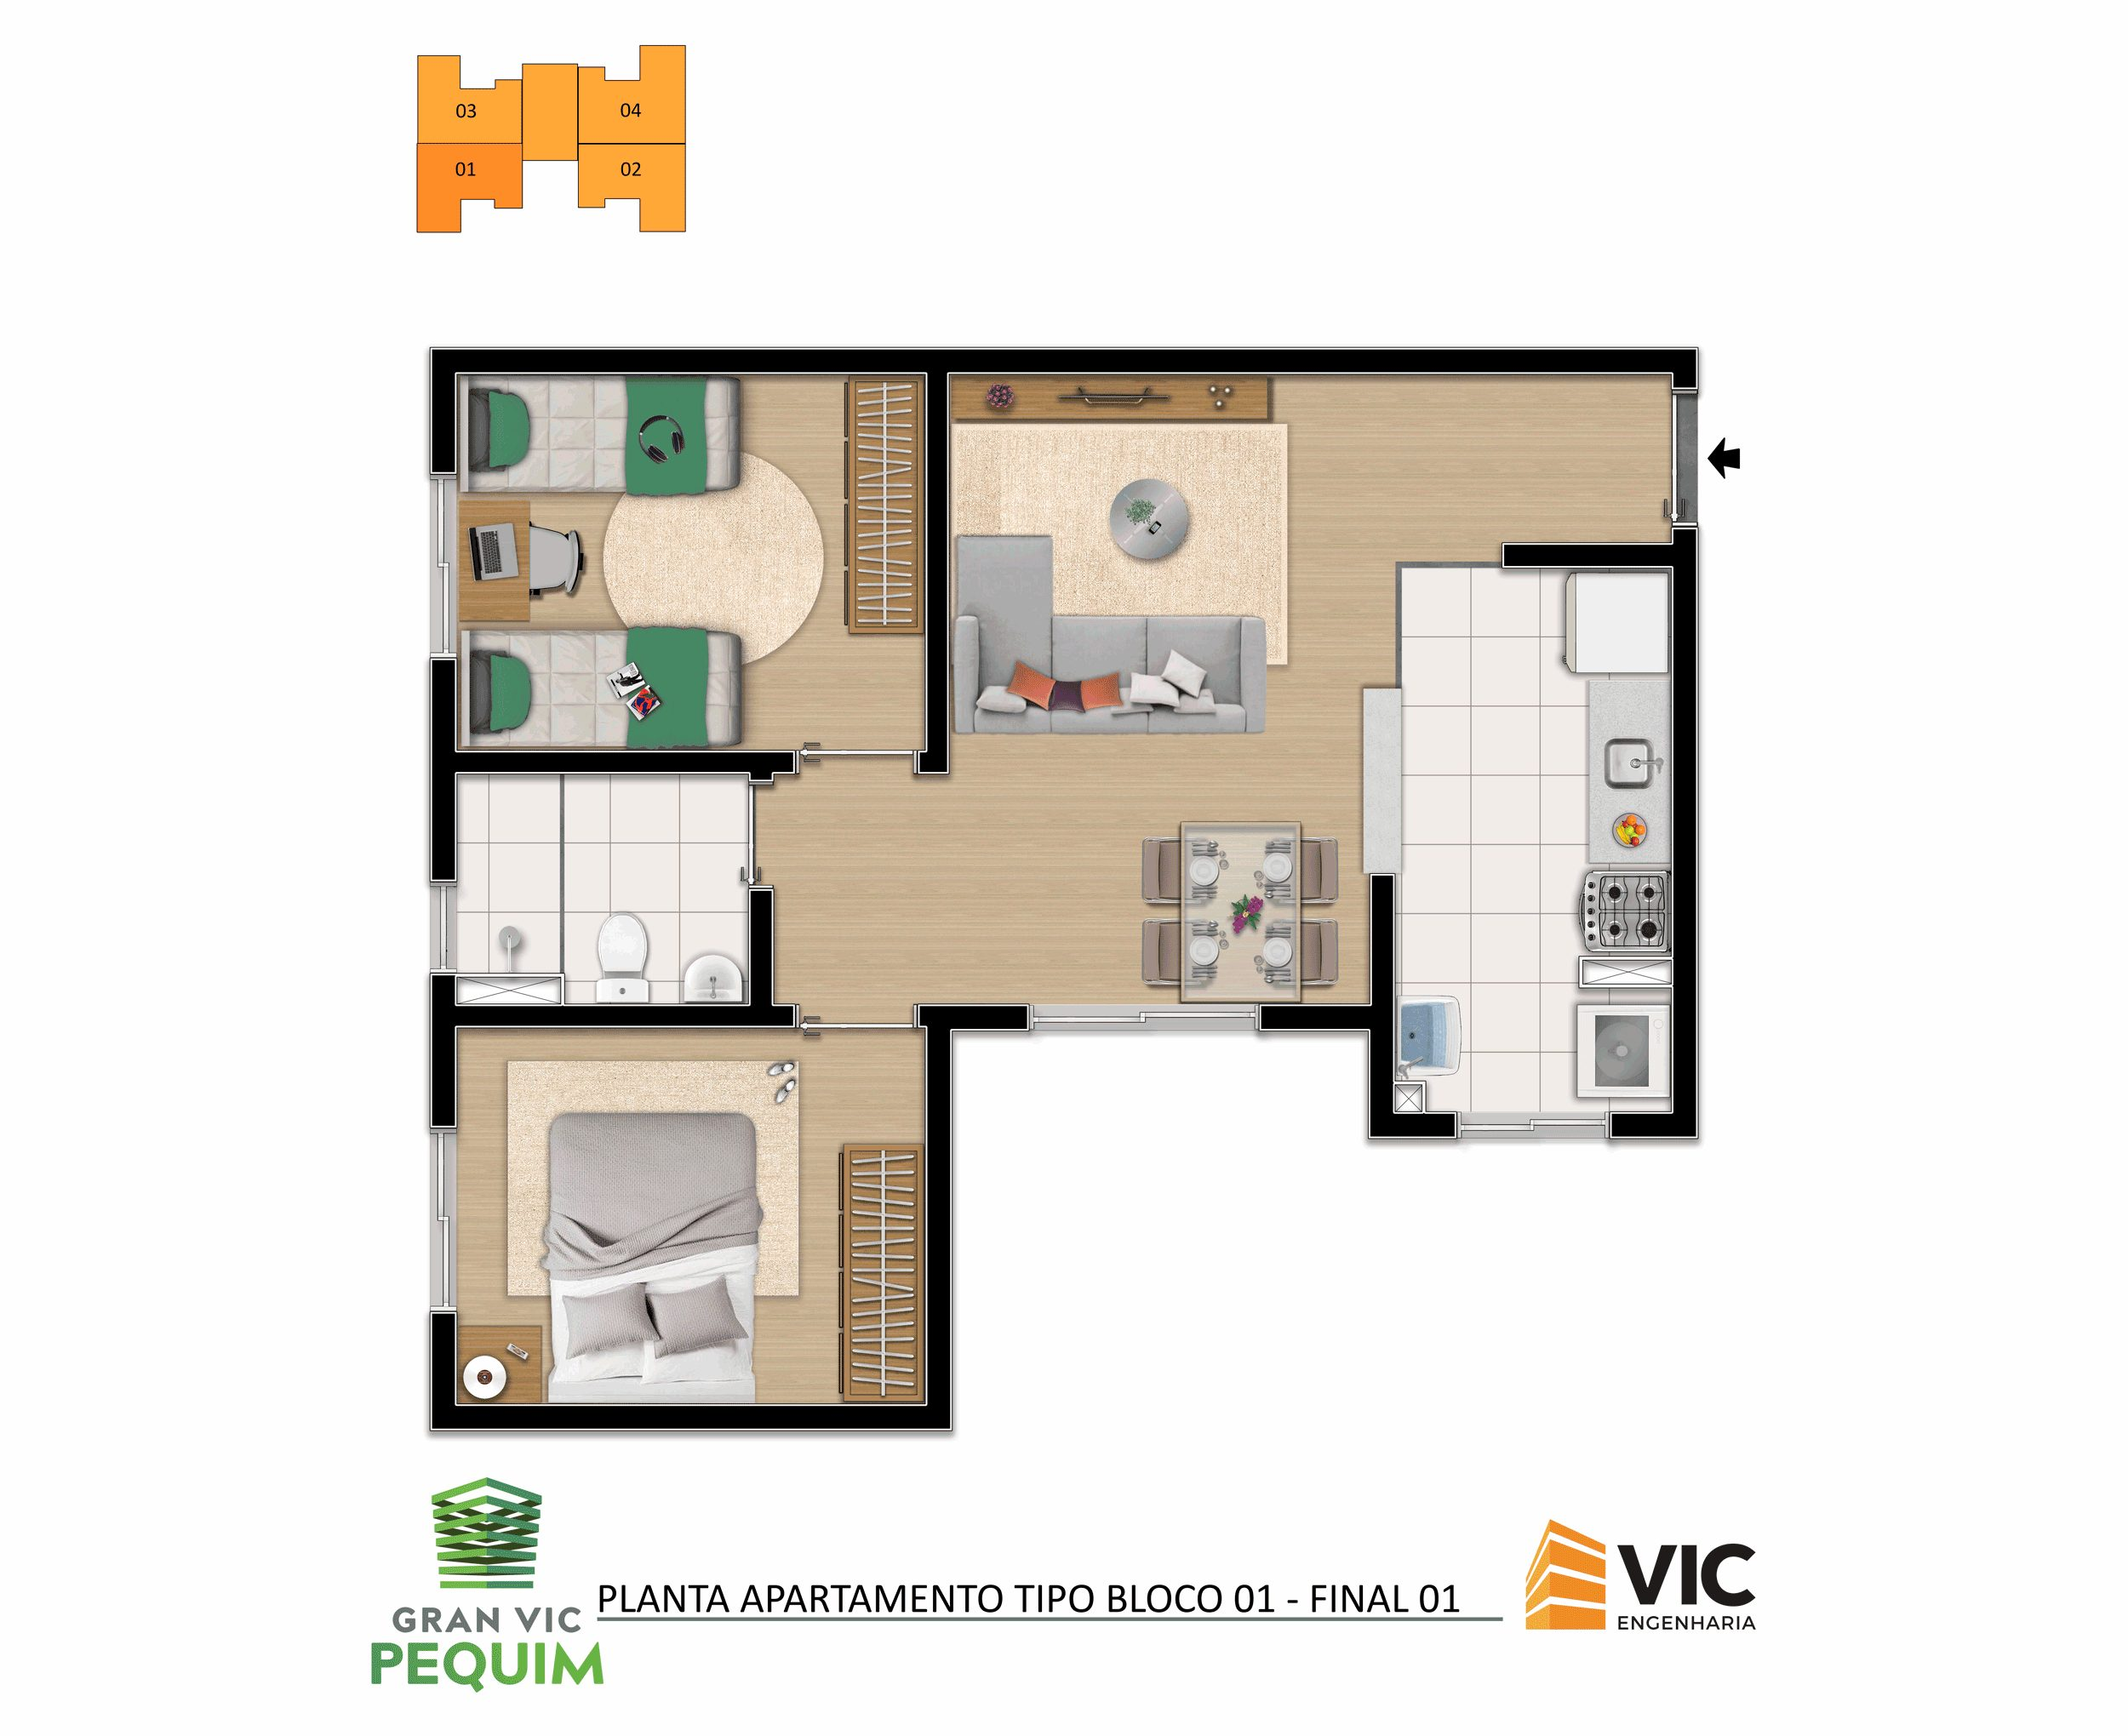 vic-engenharia-gran-vic-atenas-apartamento-tipo-torre-1-final-1